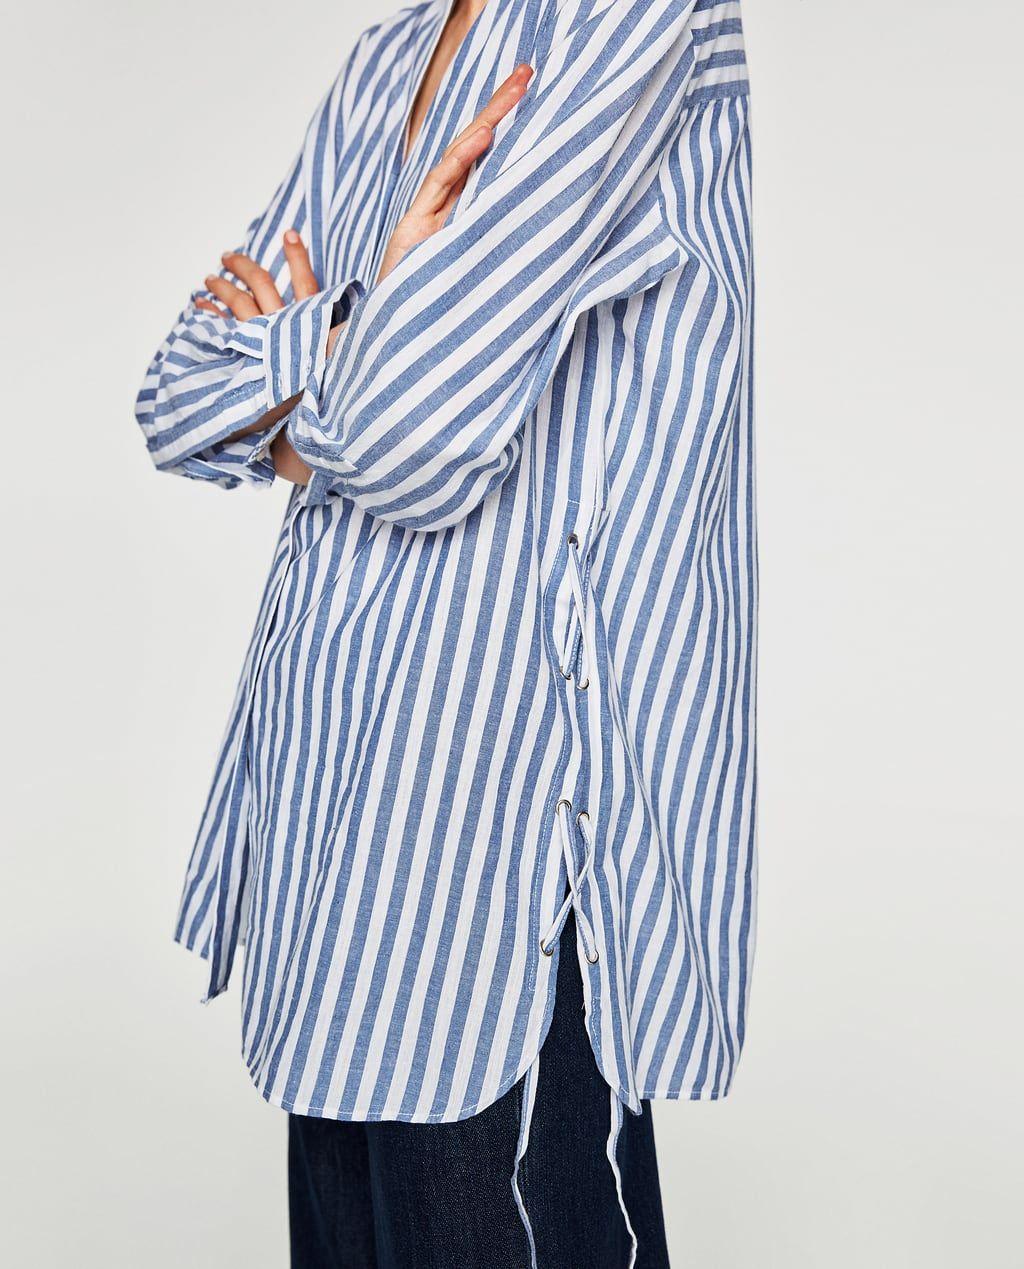 Yanlari Bagcikli Gomlek Ust Giyim Trf Zara Turkiye Ust Giyim Gomlek Kadin